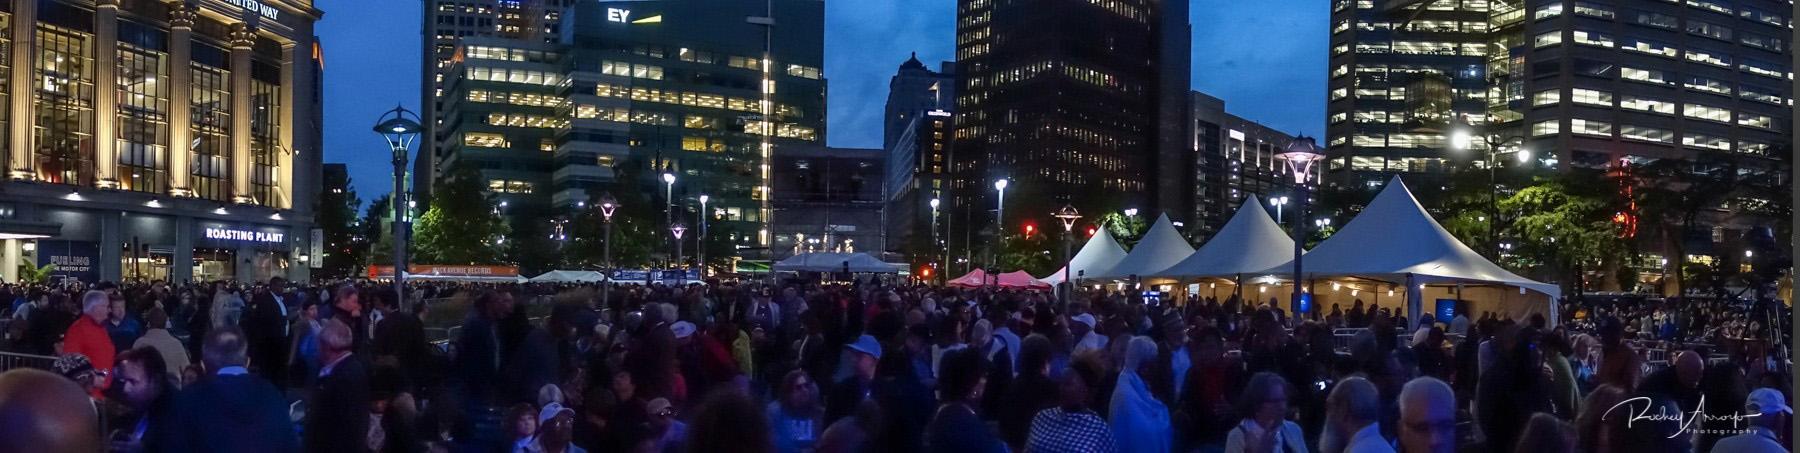 Detroit Jazz Fest 2017-08956-1504367536116